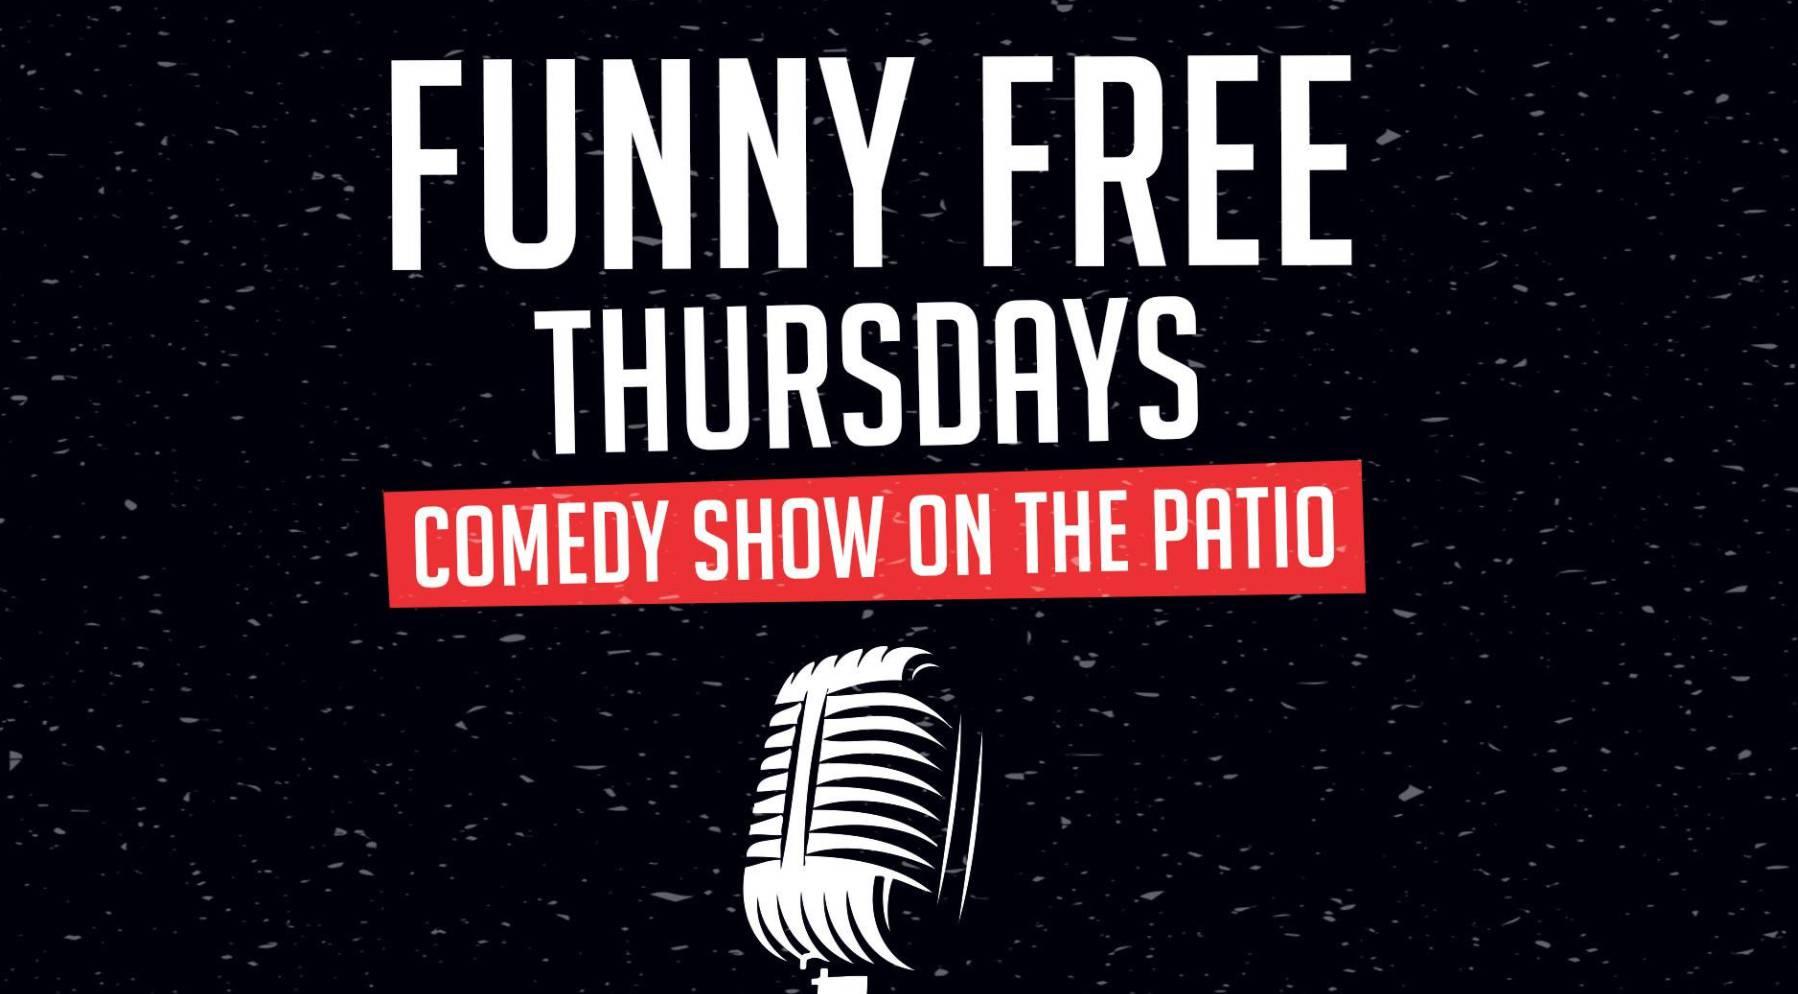 Funny Free Thursdays